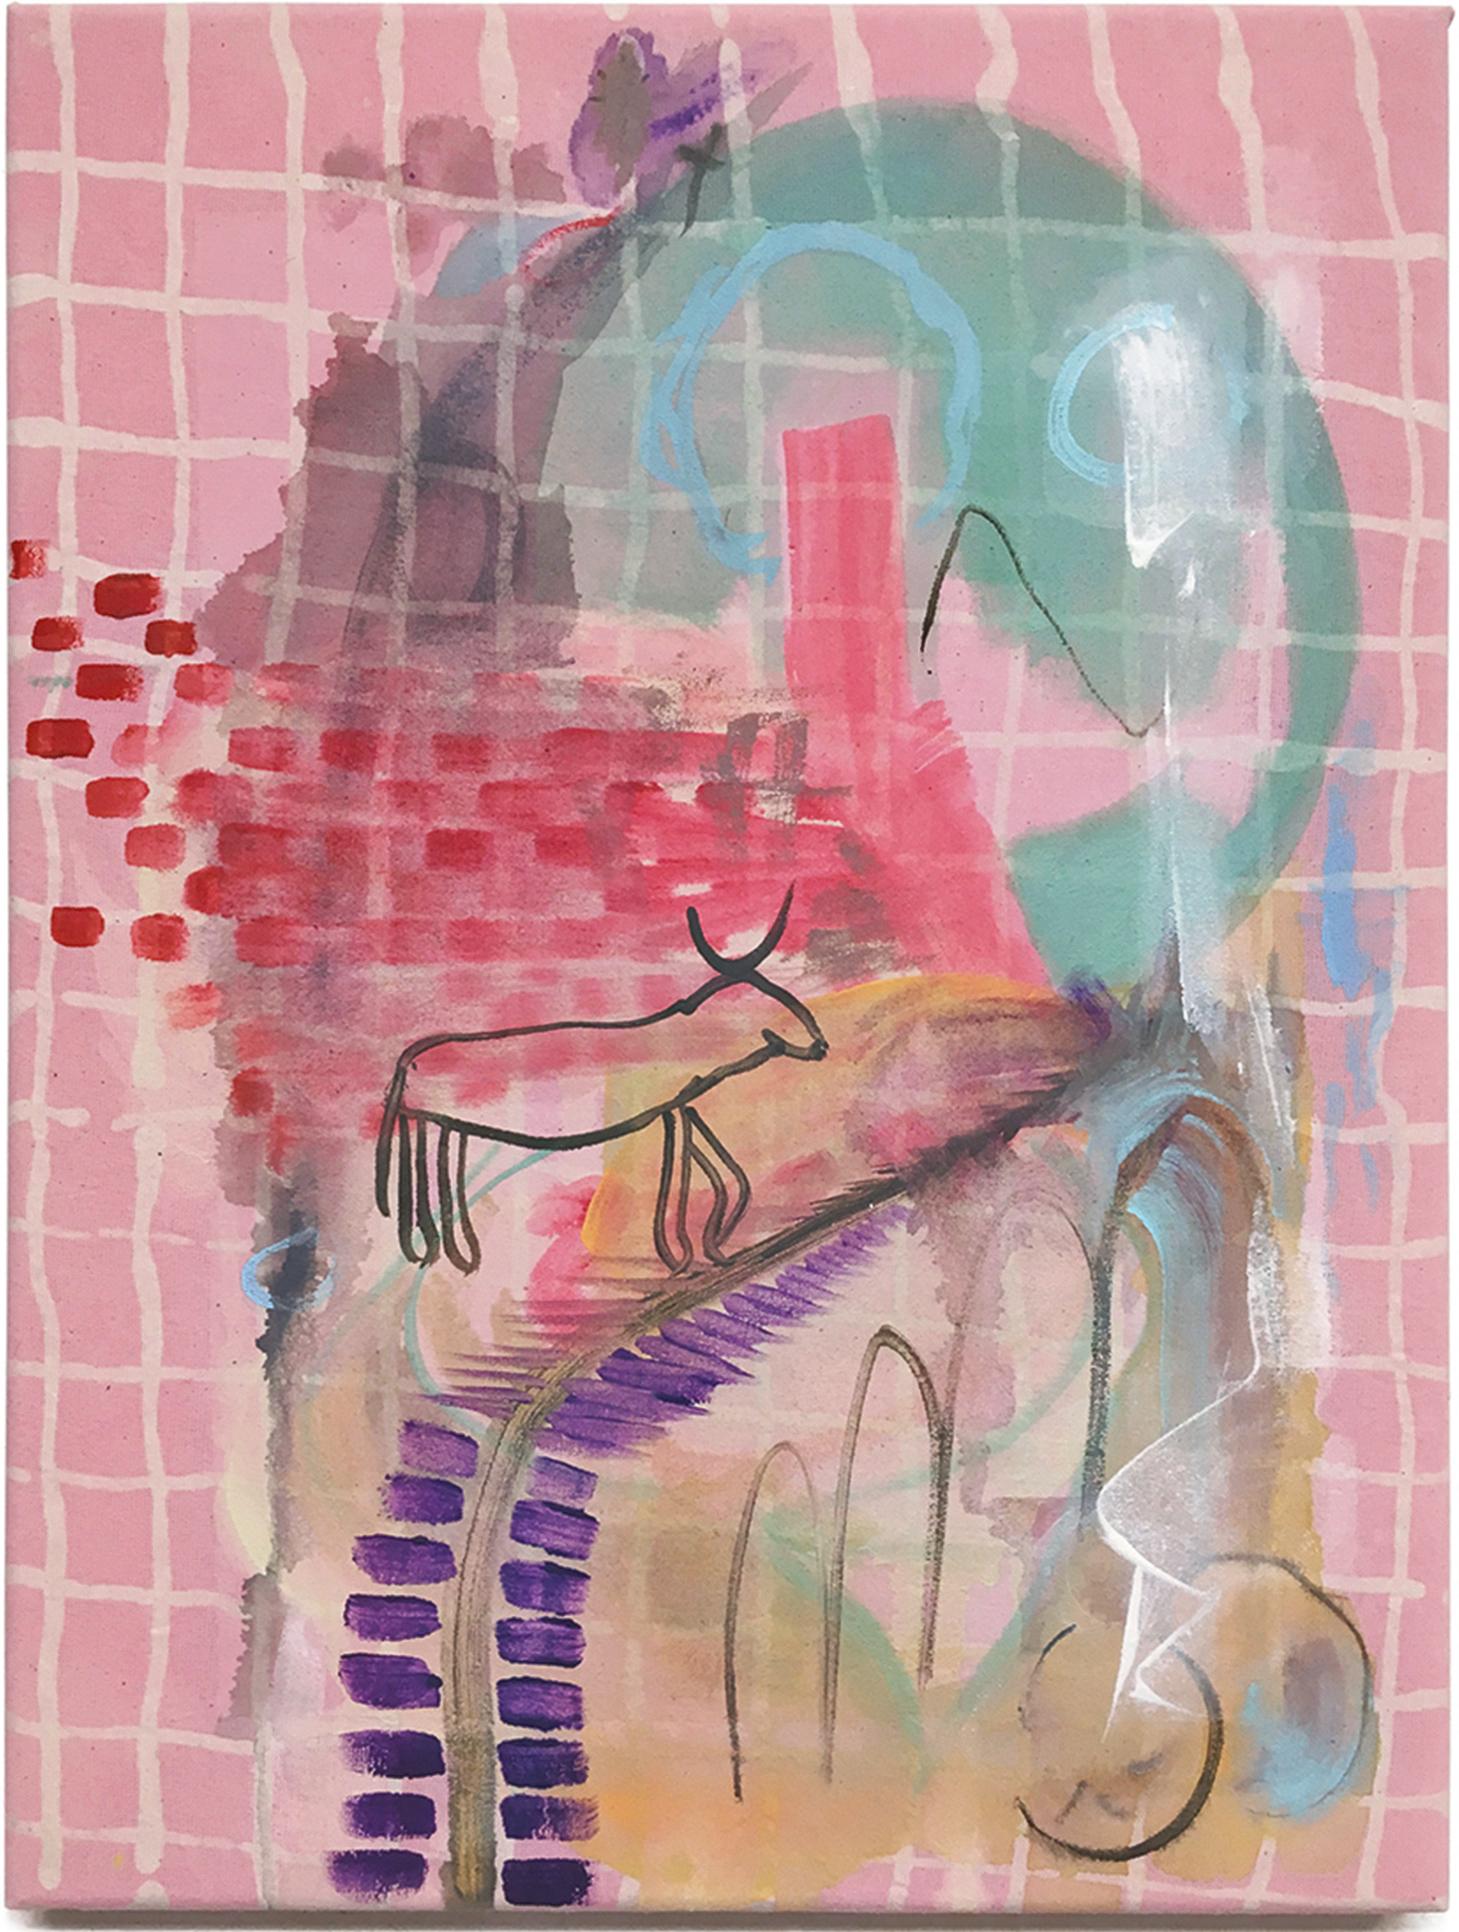 Nina-Tobien-batik-dying-checkerboard-gaming-level-escalator-mythology-painting-contemporary-art-color-dream